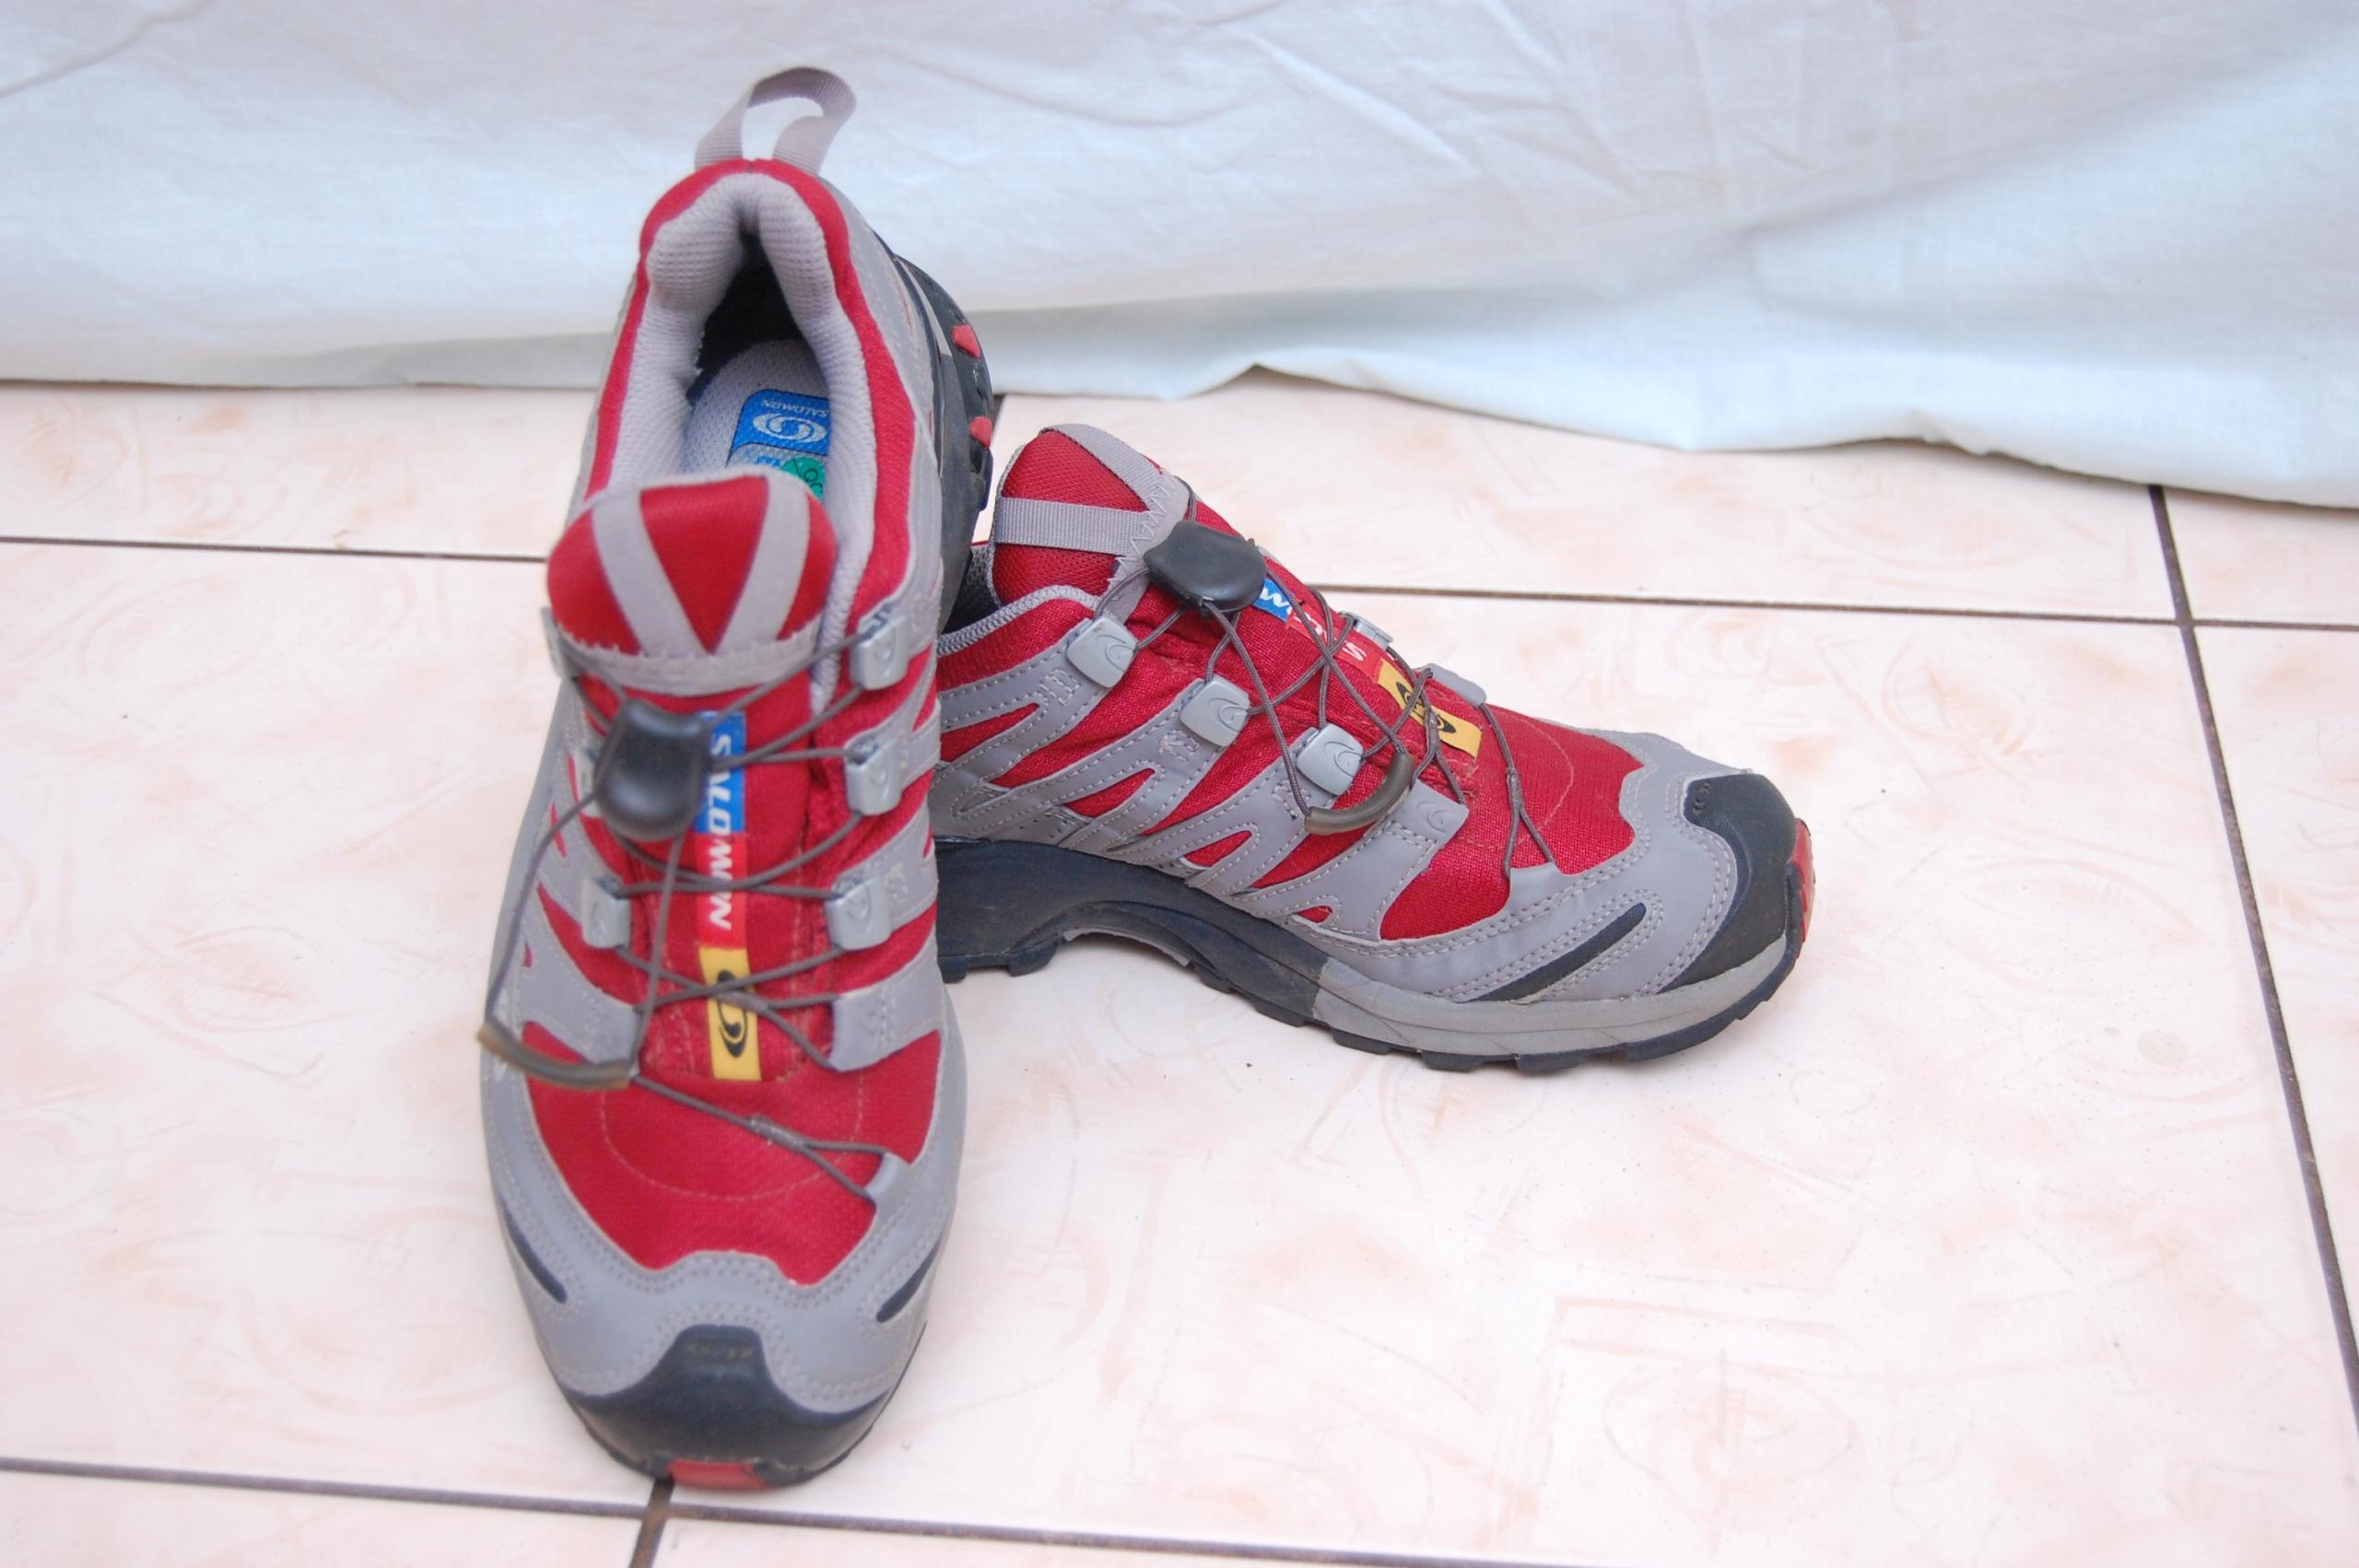 36a58644cf89f Buty trekkingowe Salomon Gore Tex. R. 38. - 7734550652 - oficjalne ...